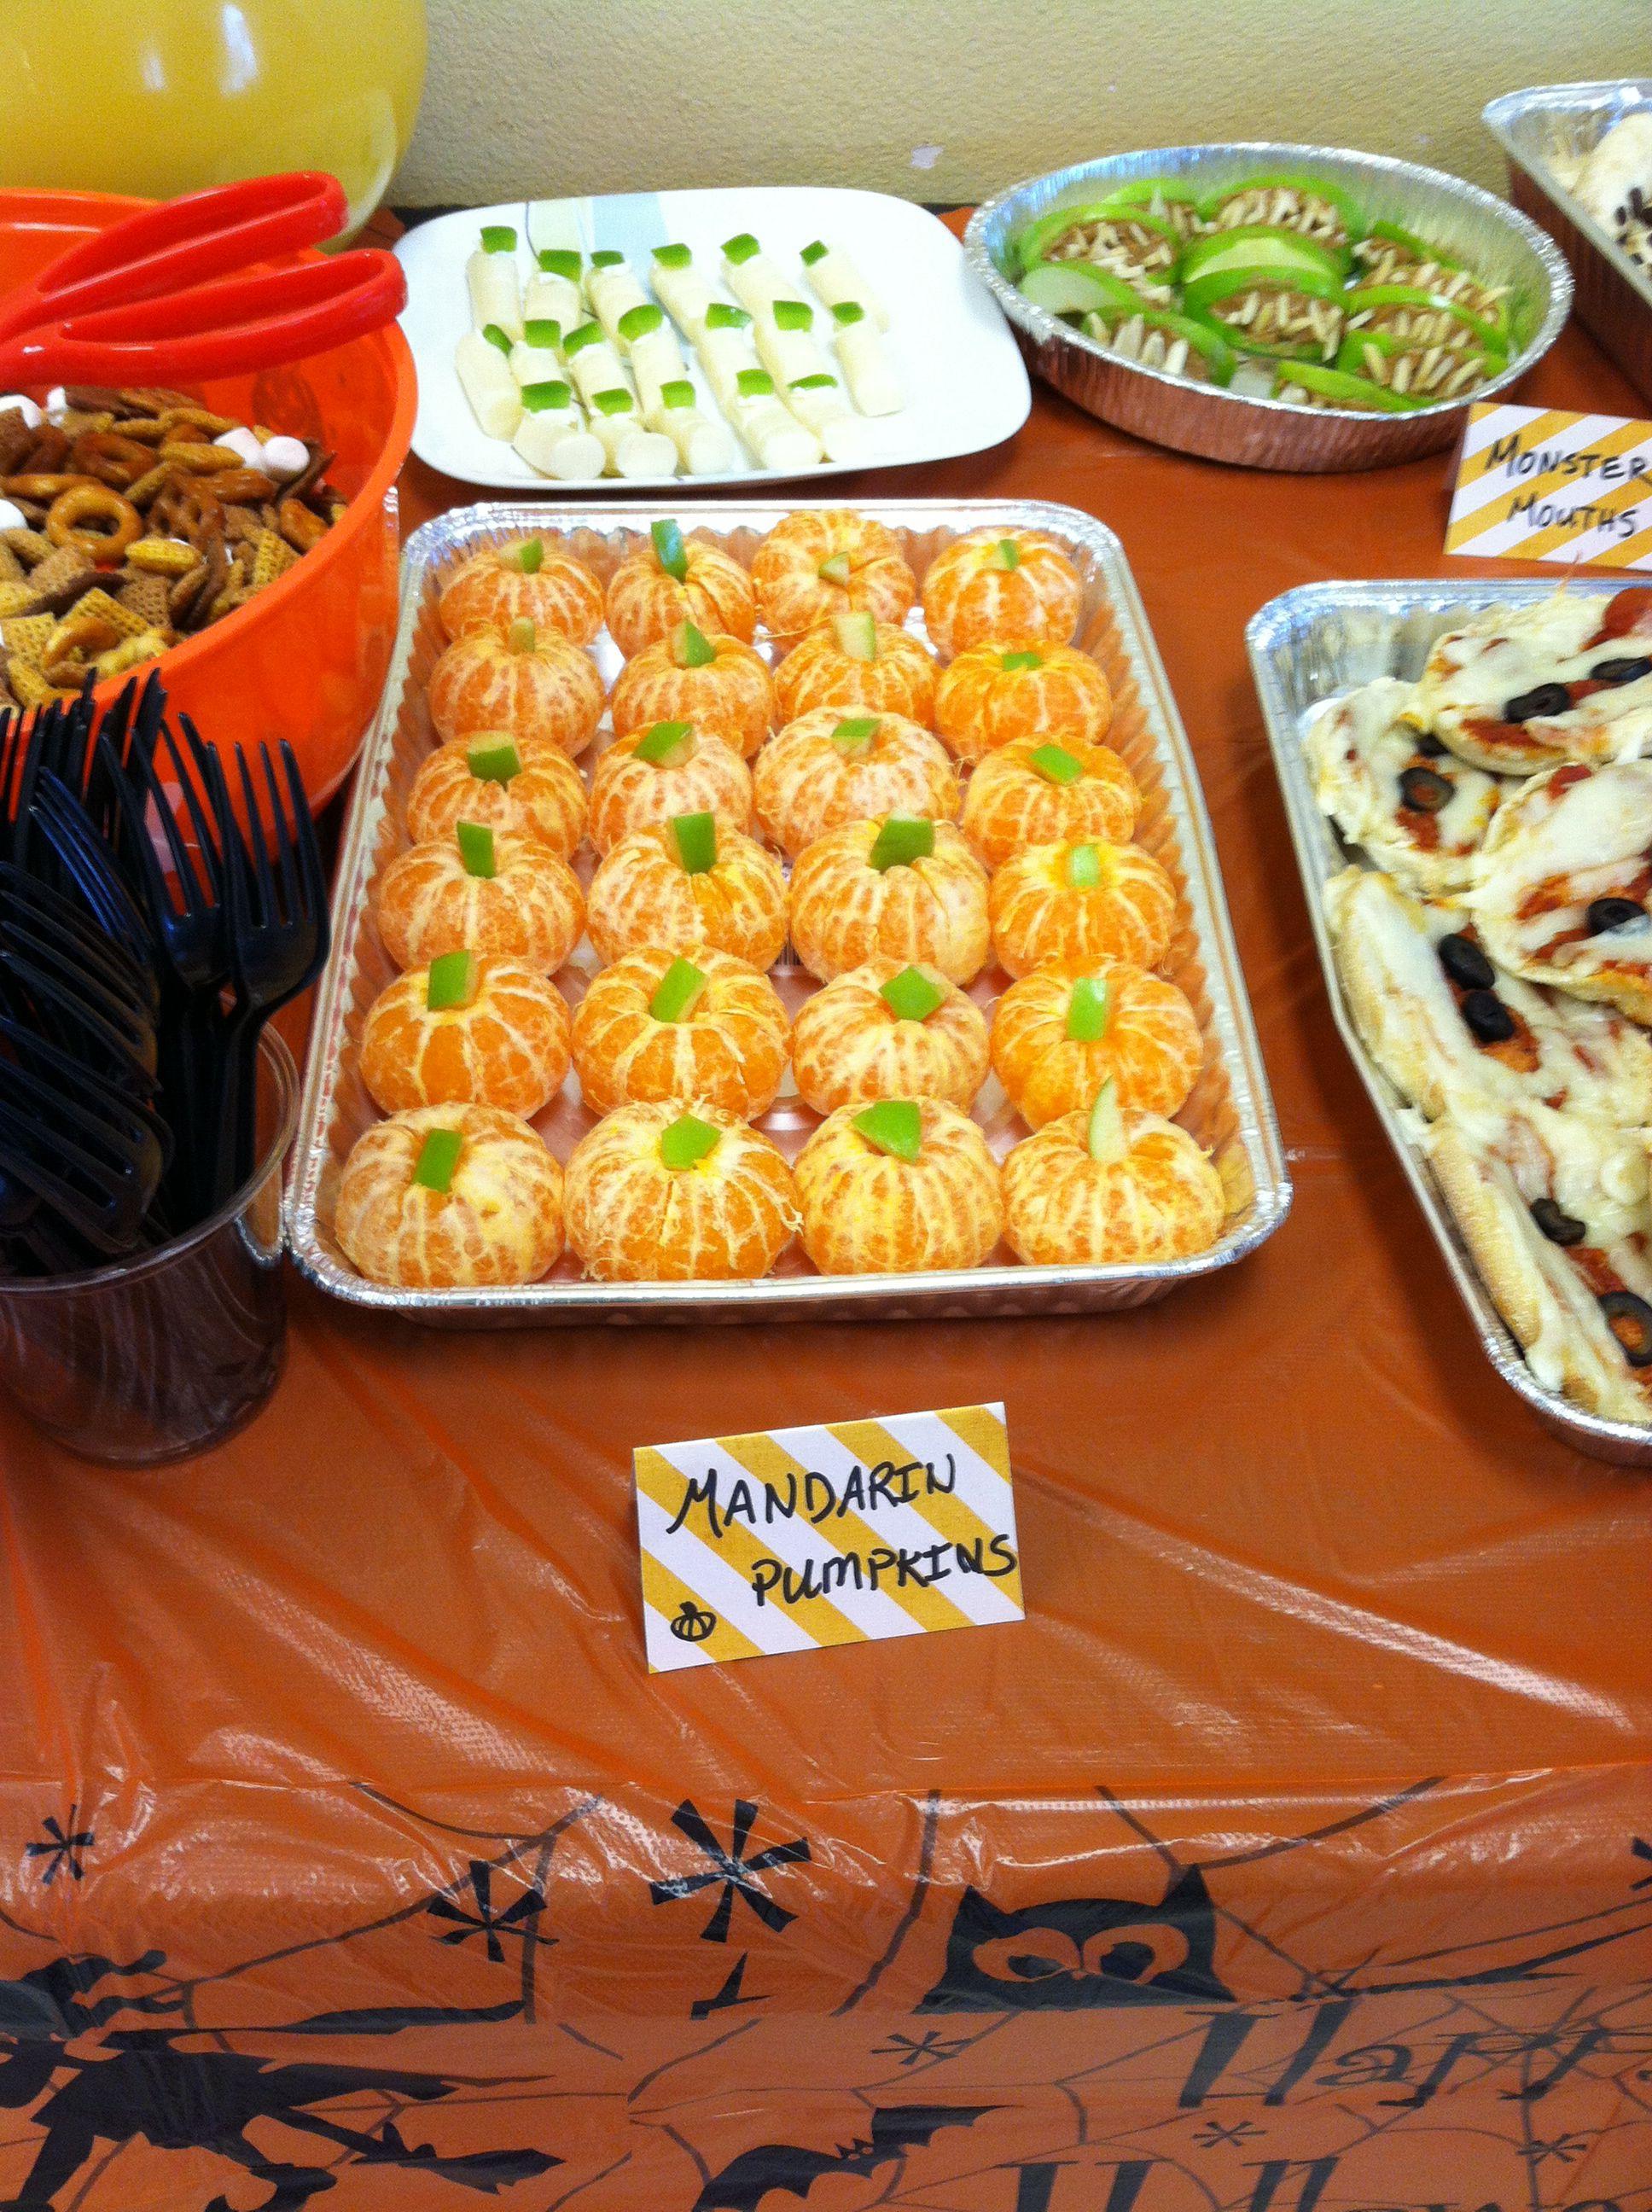 Mandarin pumpkins